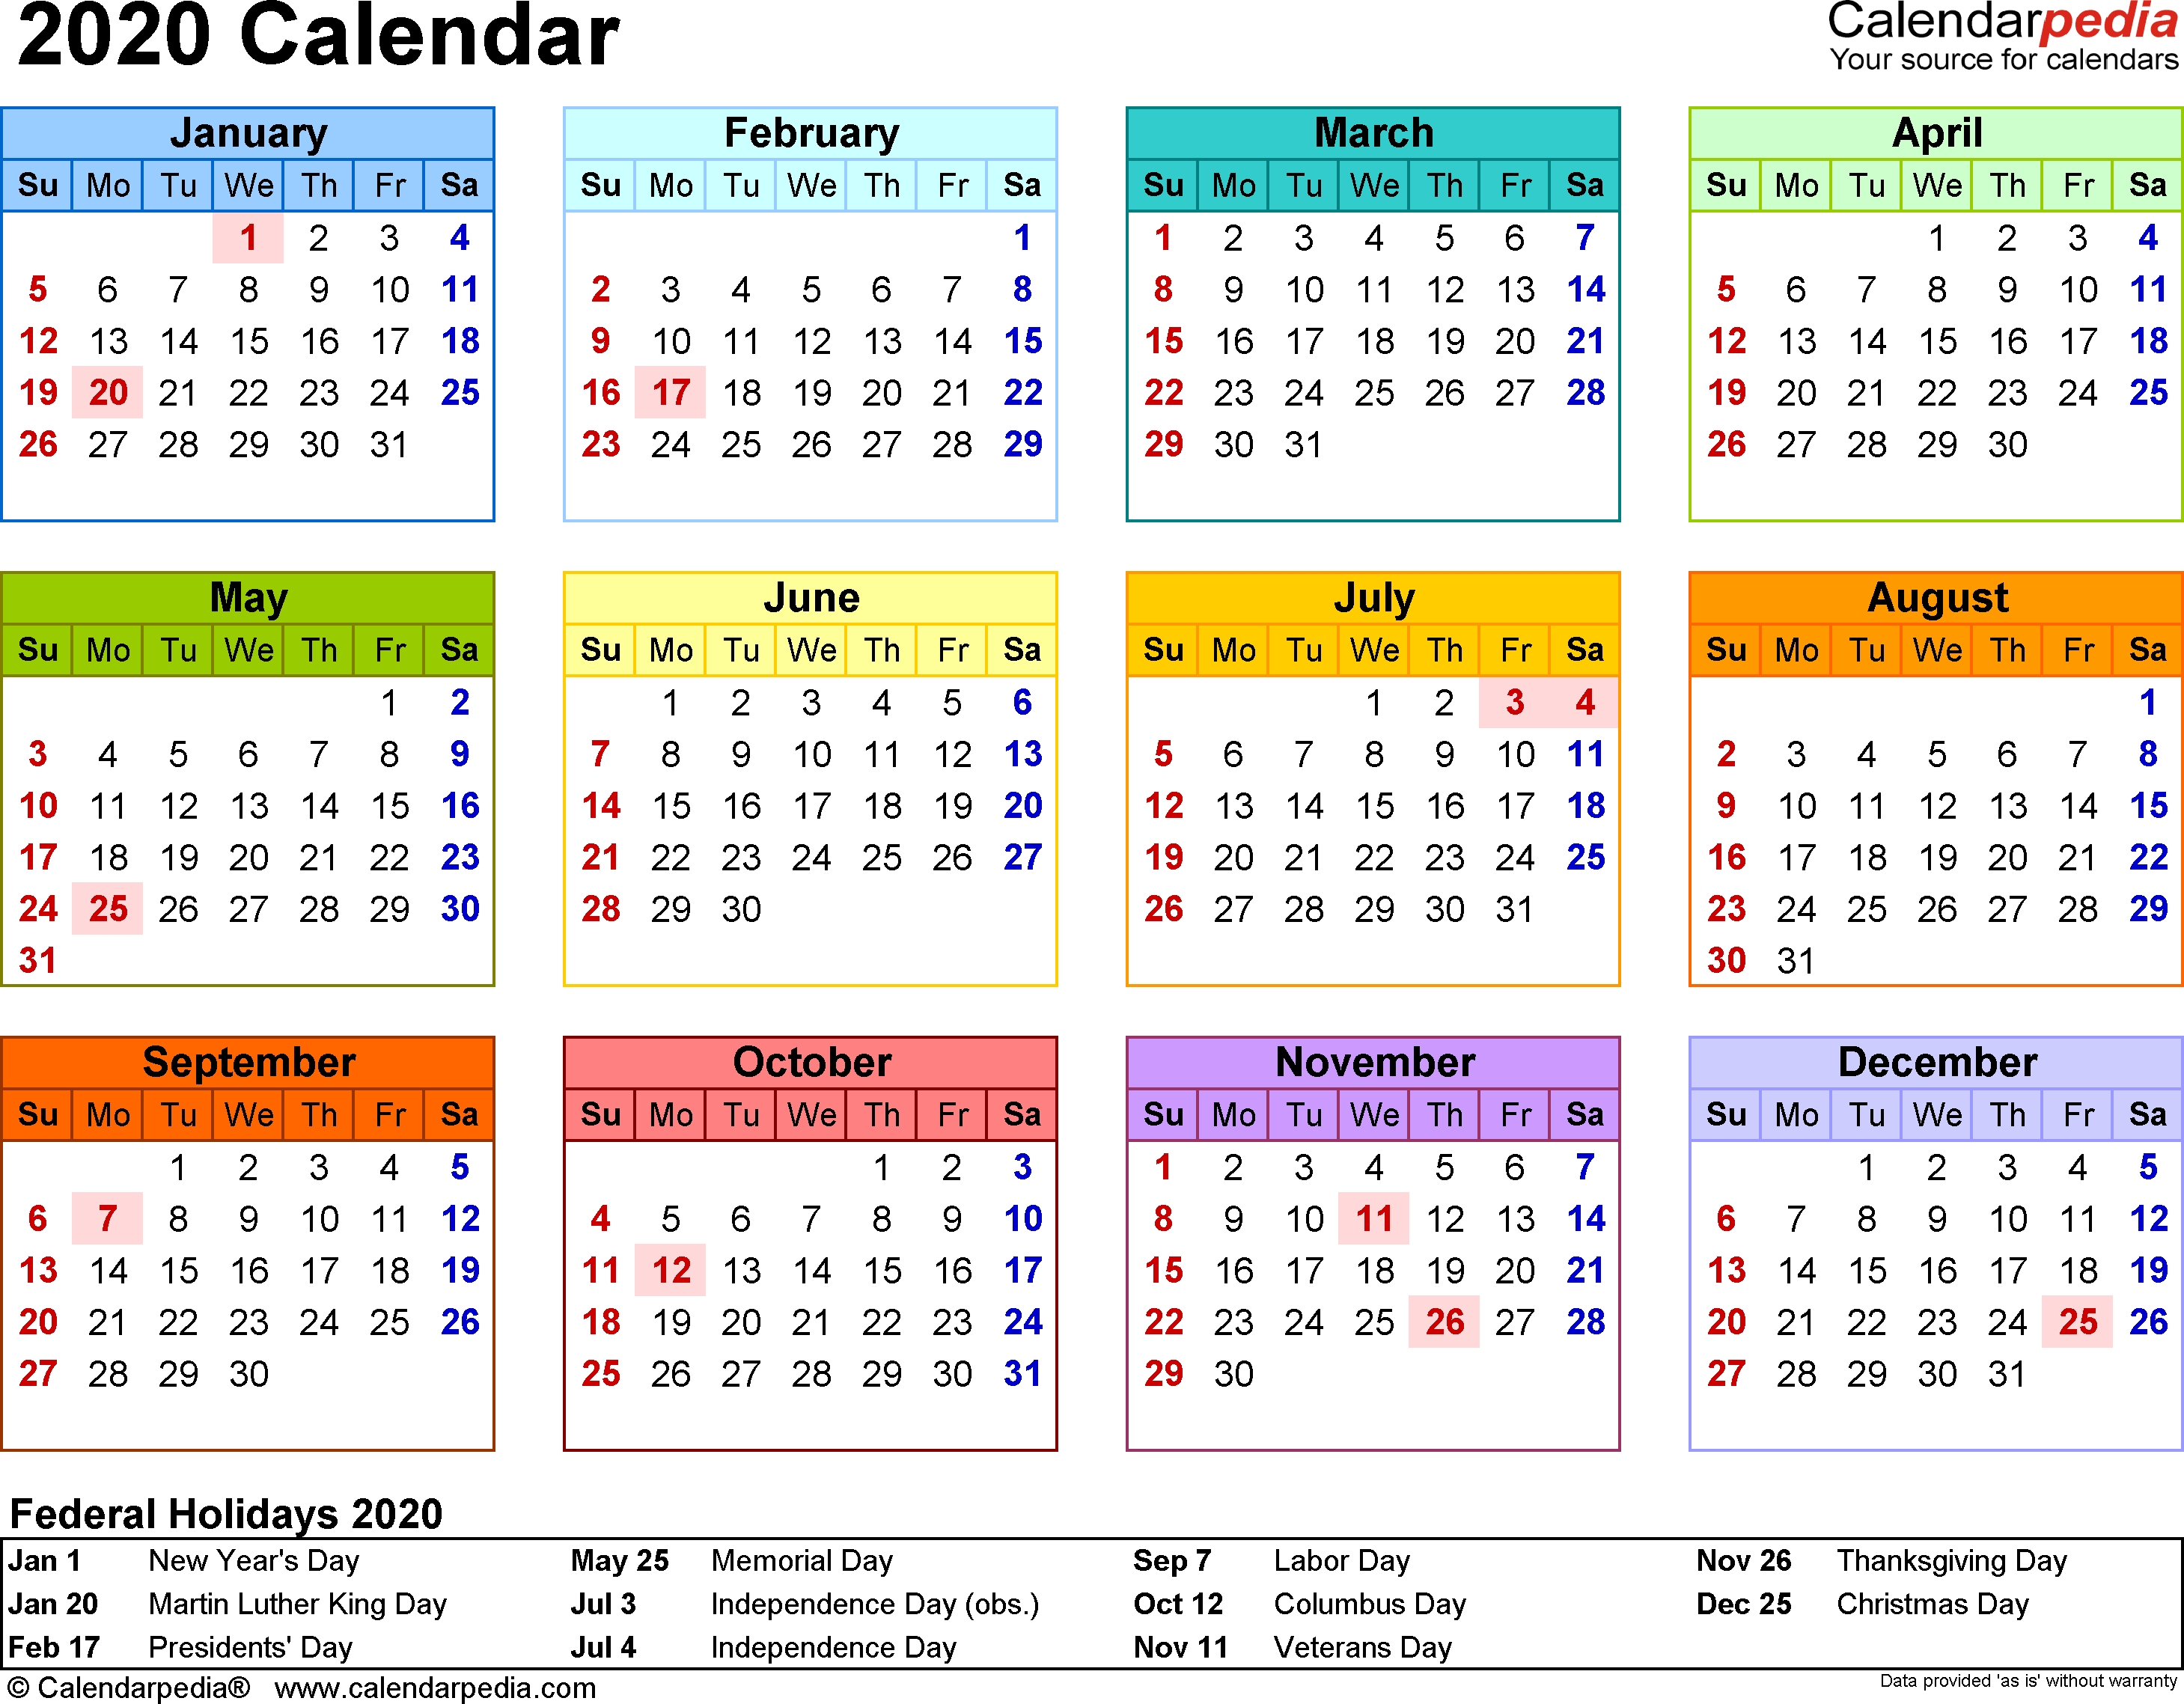 2020 Calendar - Download 18 Free Printable Excel Templates-January 2020 Calendar South Africa